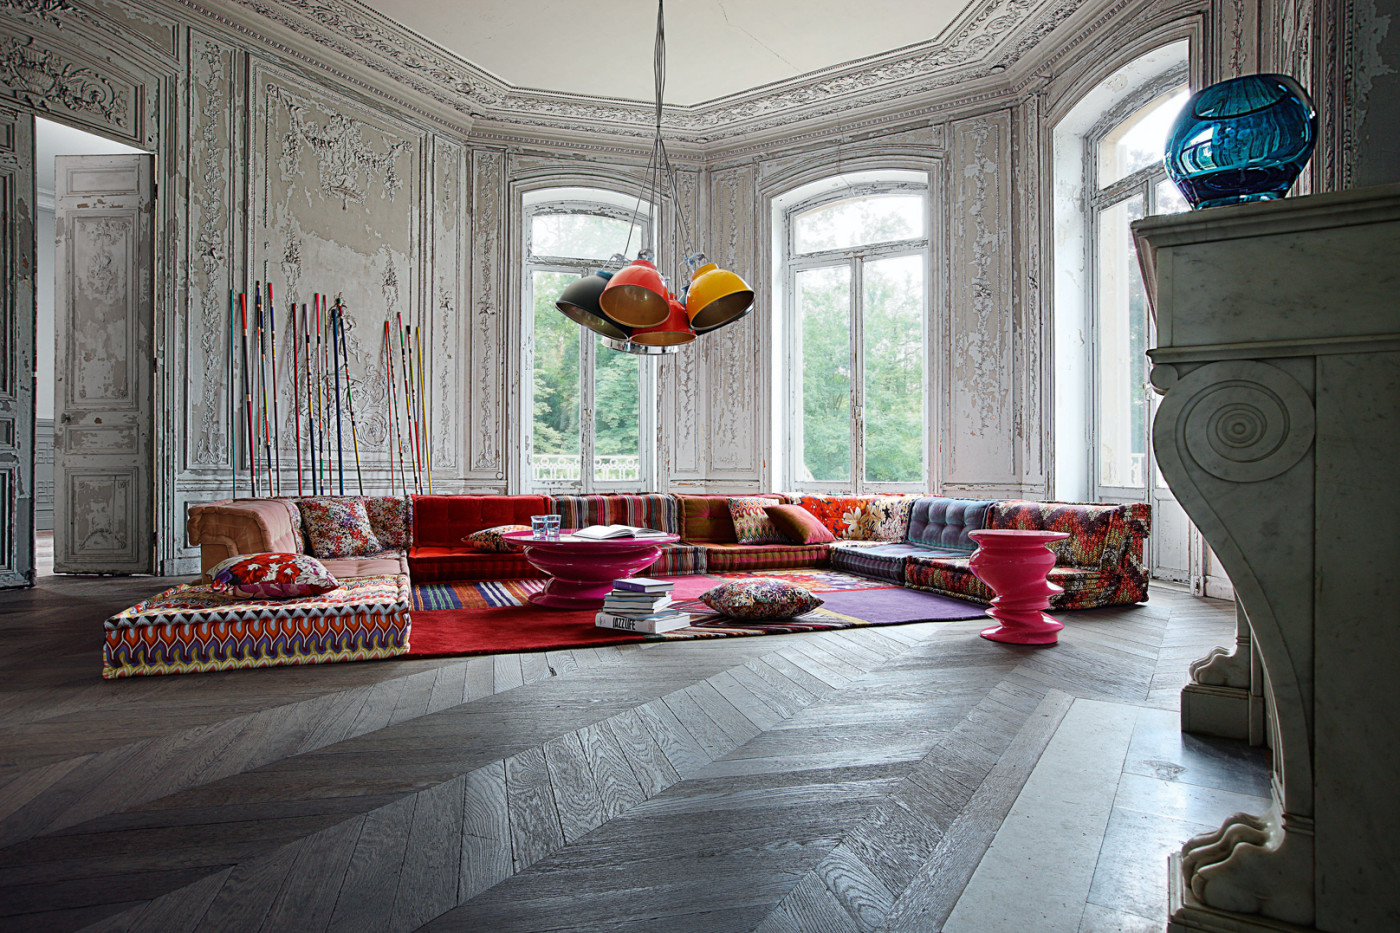 sofa mah jong von roche bobois produkttrends. Black Bedroom Furniture Sets. Home Design Ideas